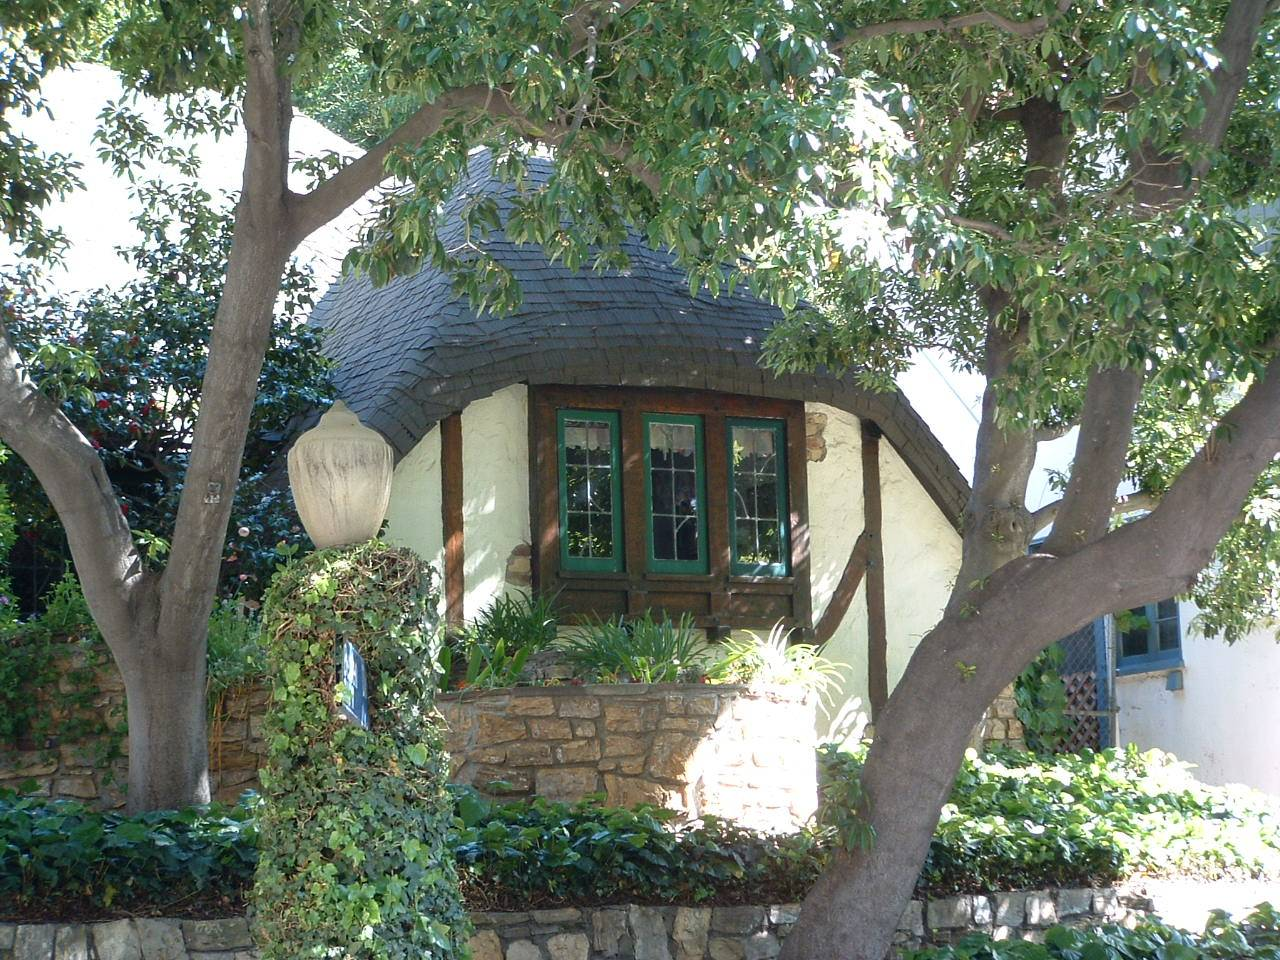 Storybook Cottage Detail